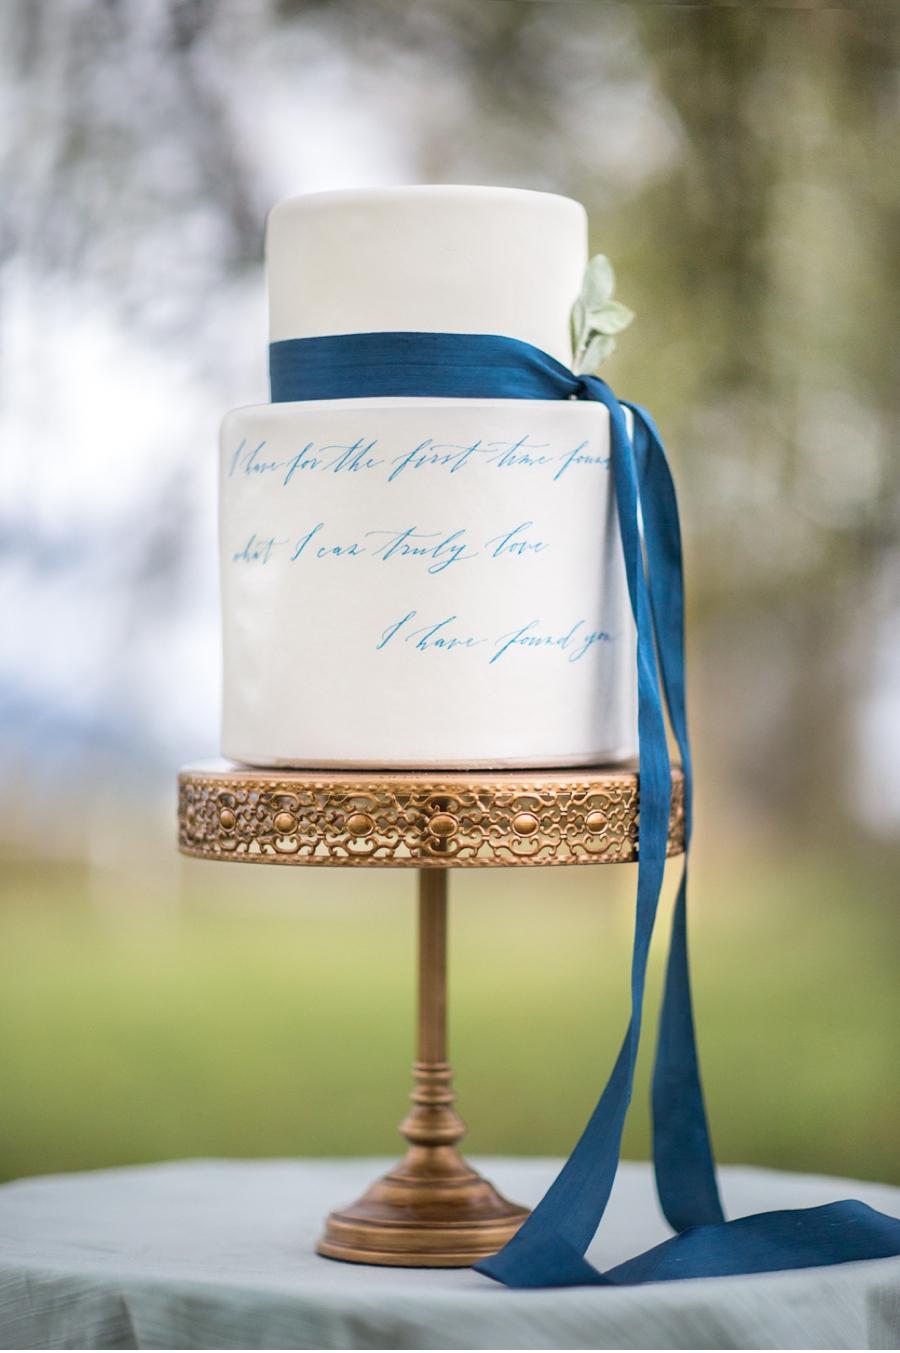 Fine-Art-Wedding-Cake-with-Script